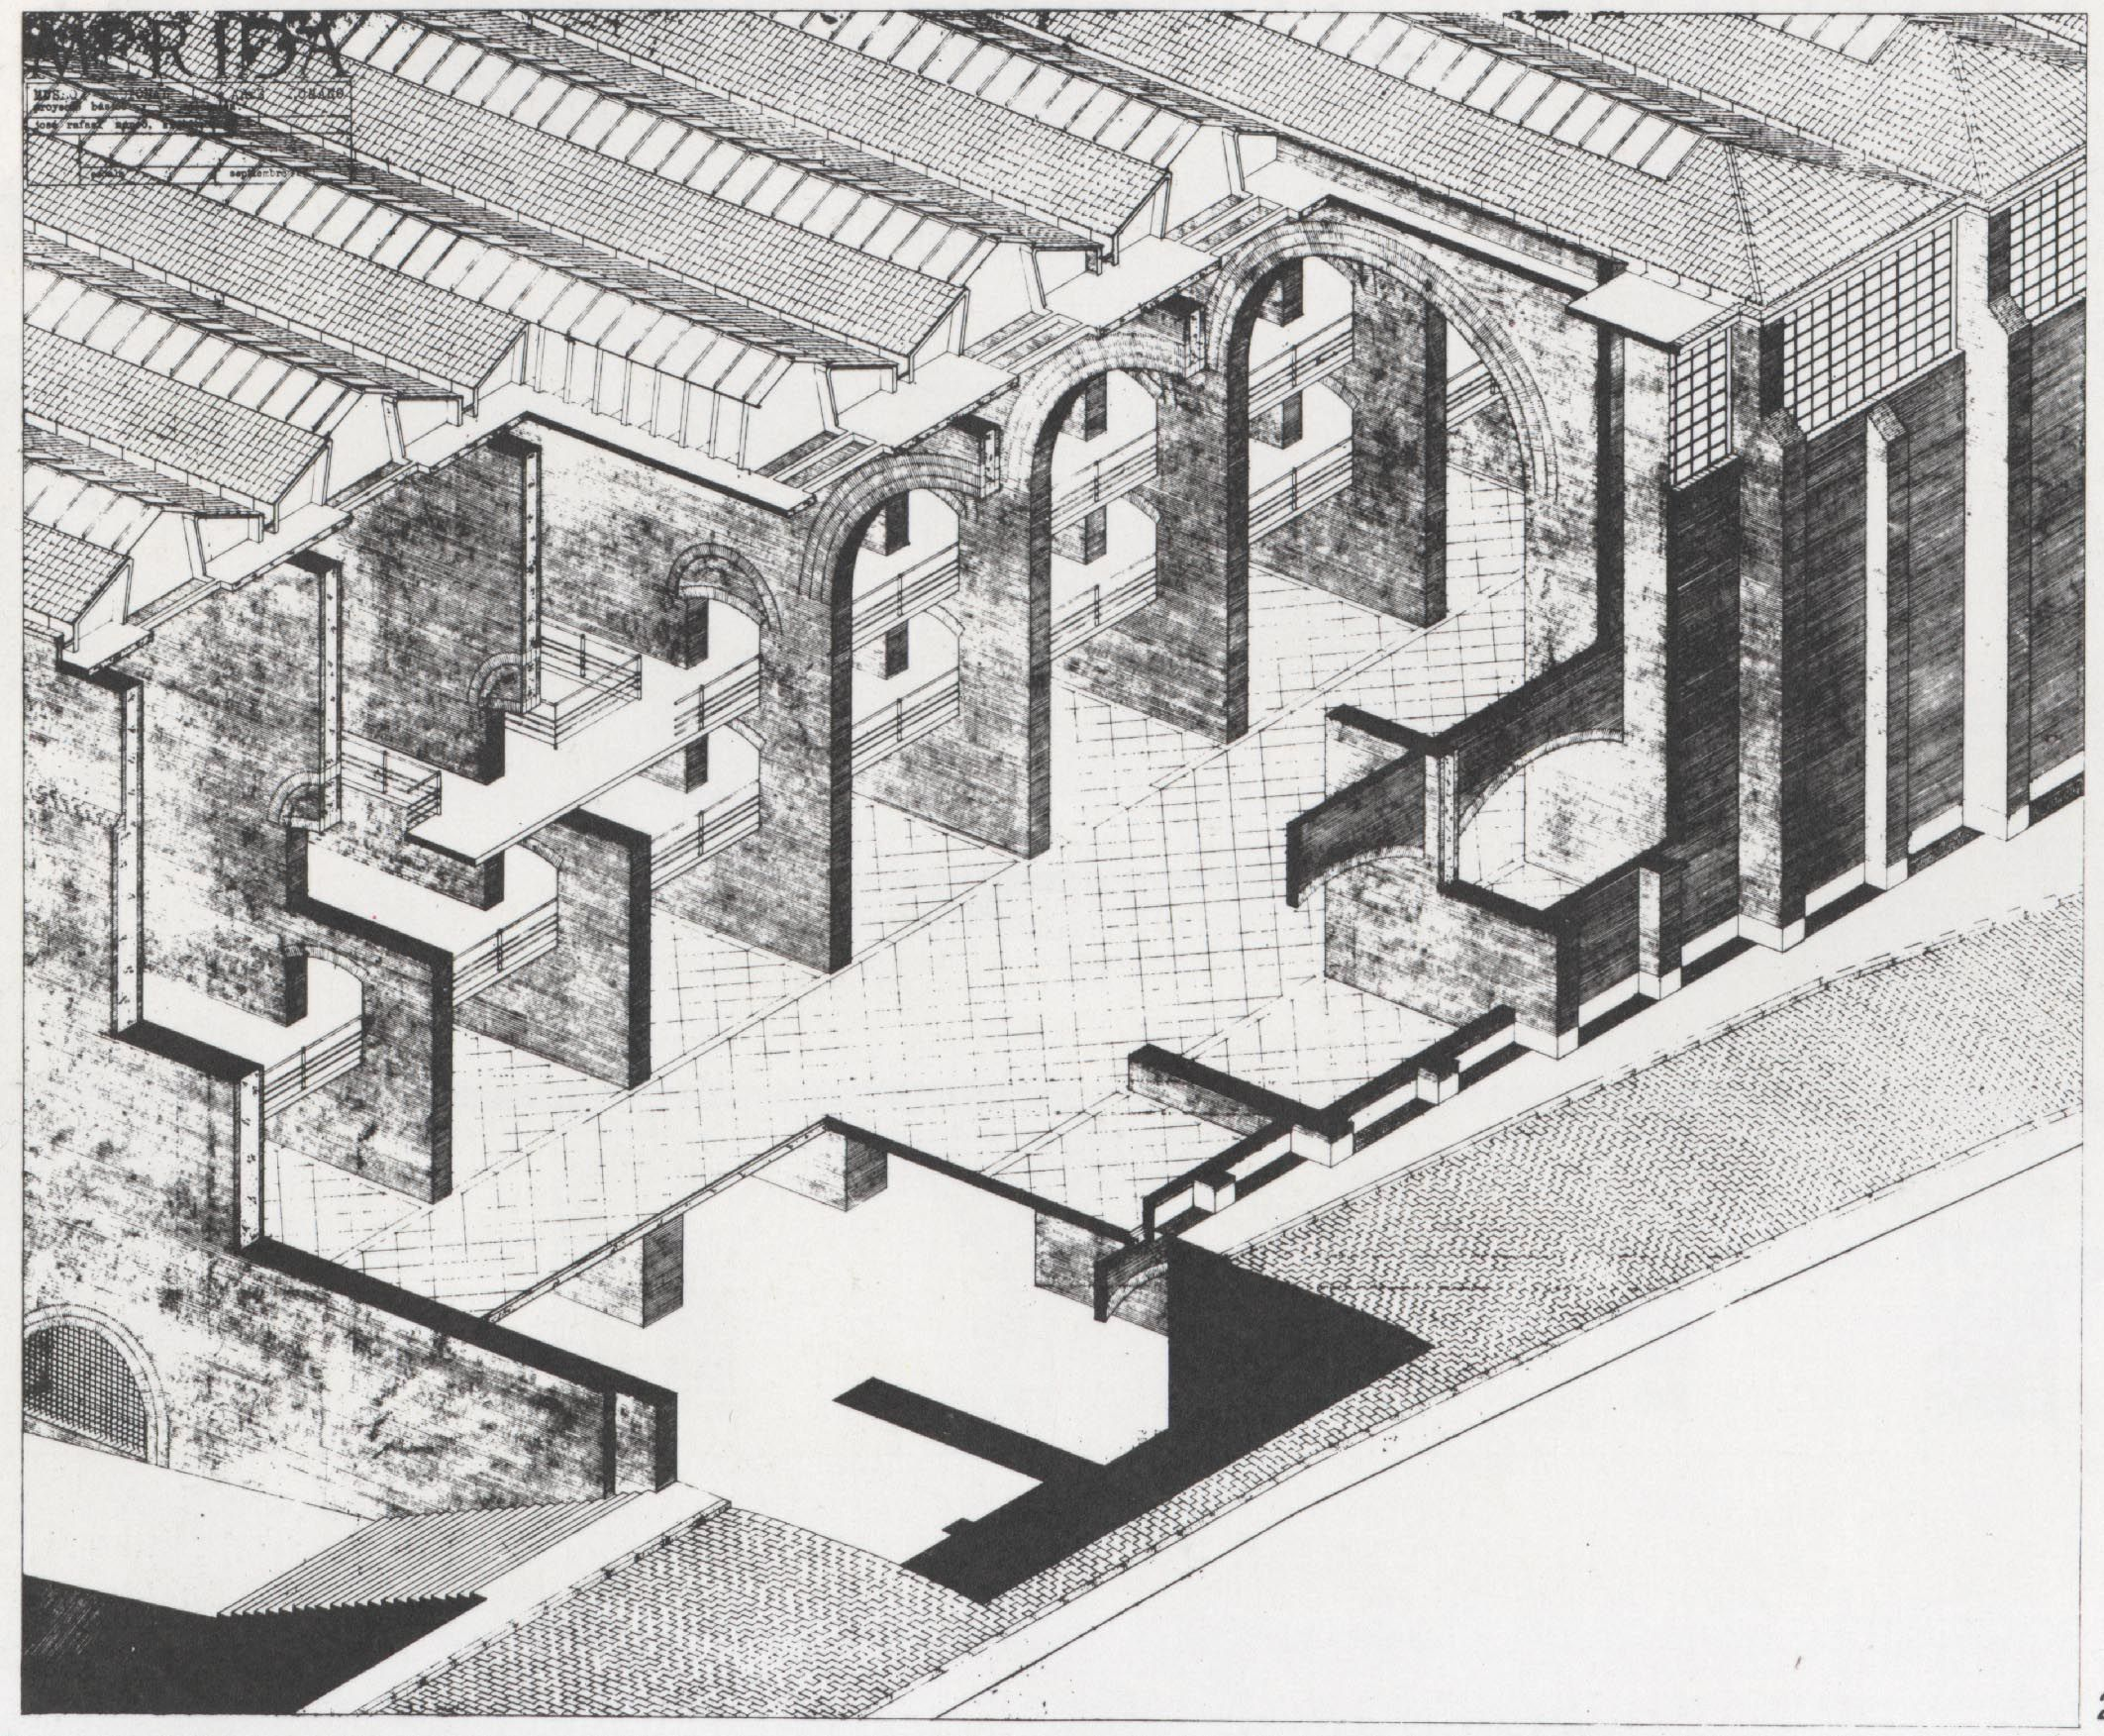 museo de arte romano moneo - Google Search